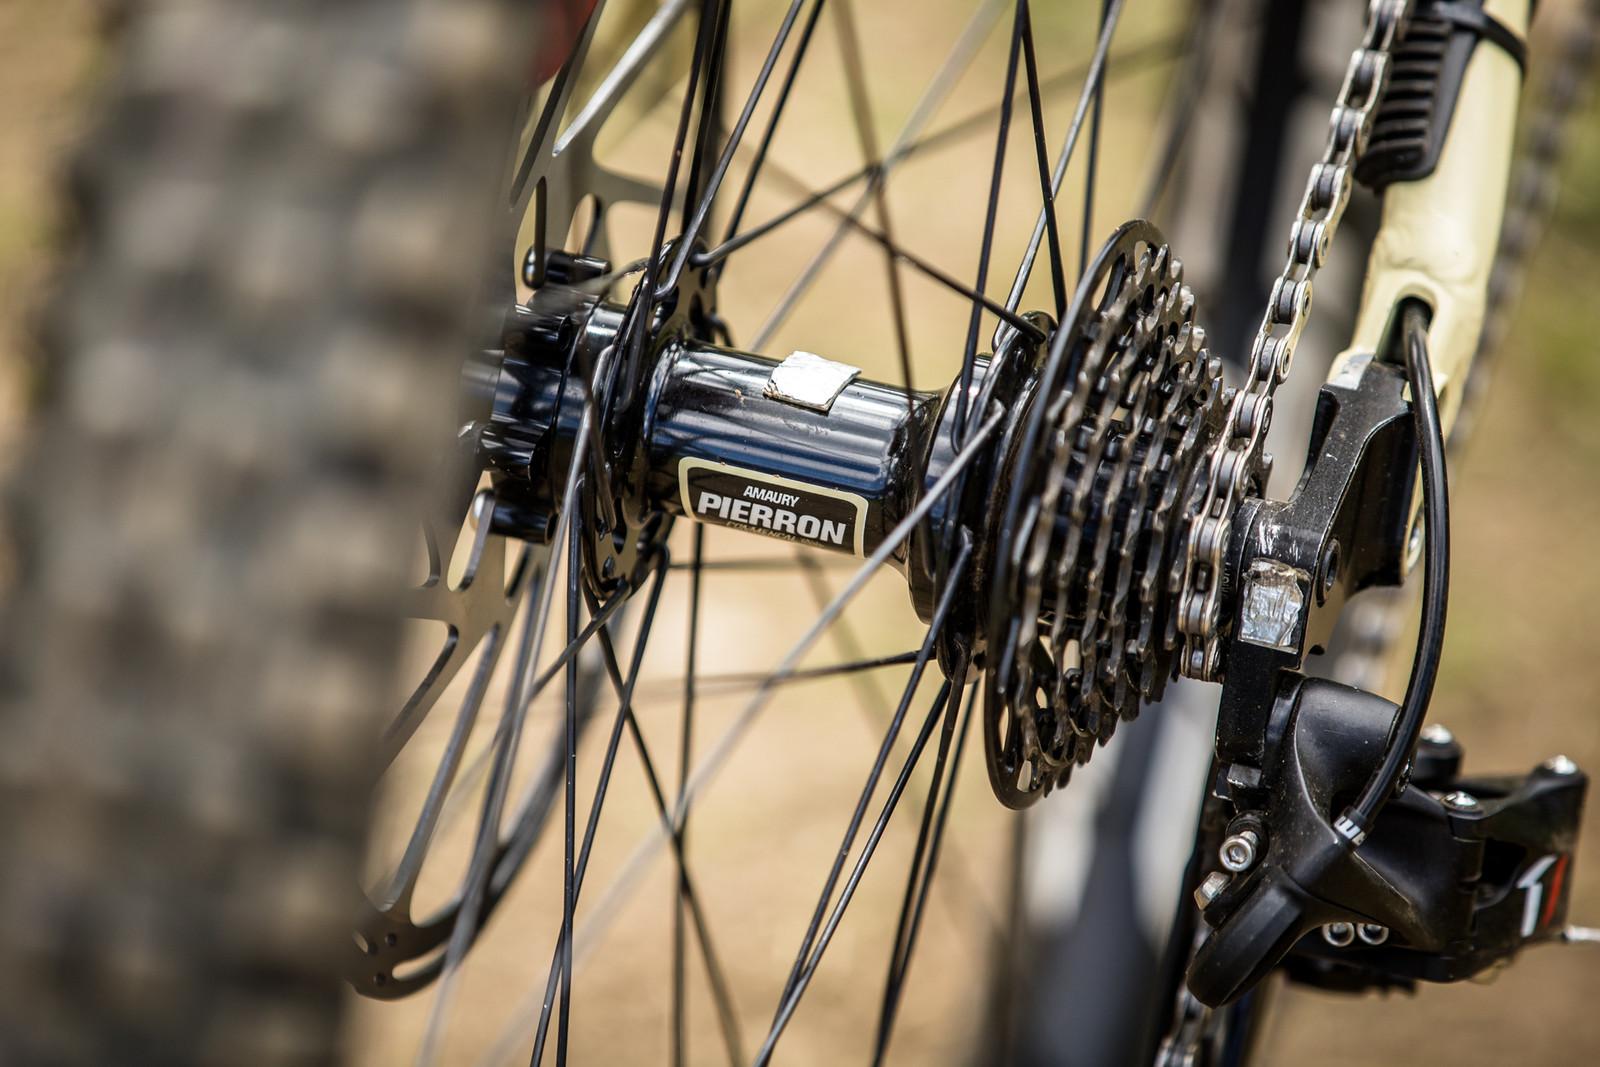 Gotcha - WINNING BIKE - Amaury Pierron's Commencal Supreme DH 29 - Mountain Biking Pictures - Vital MTB